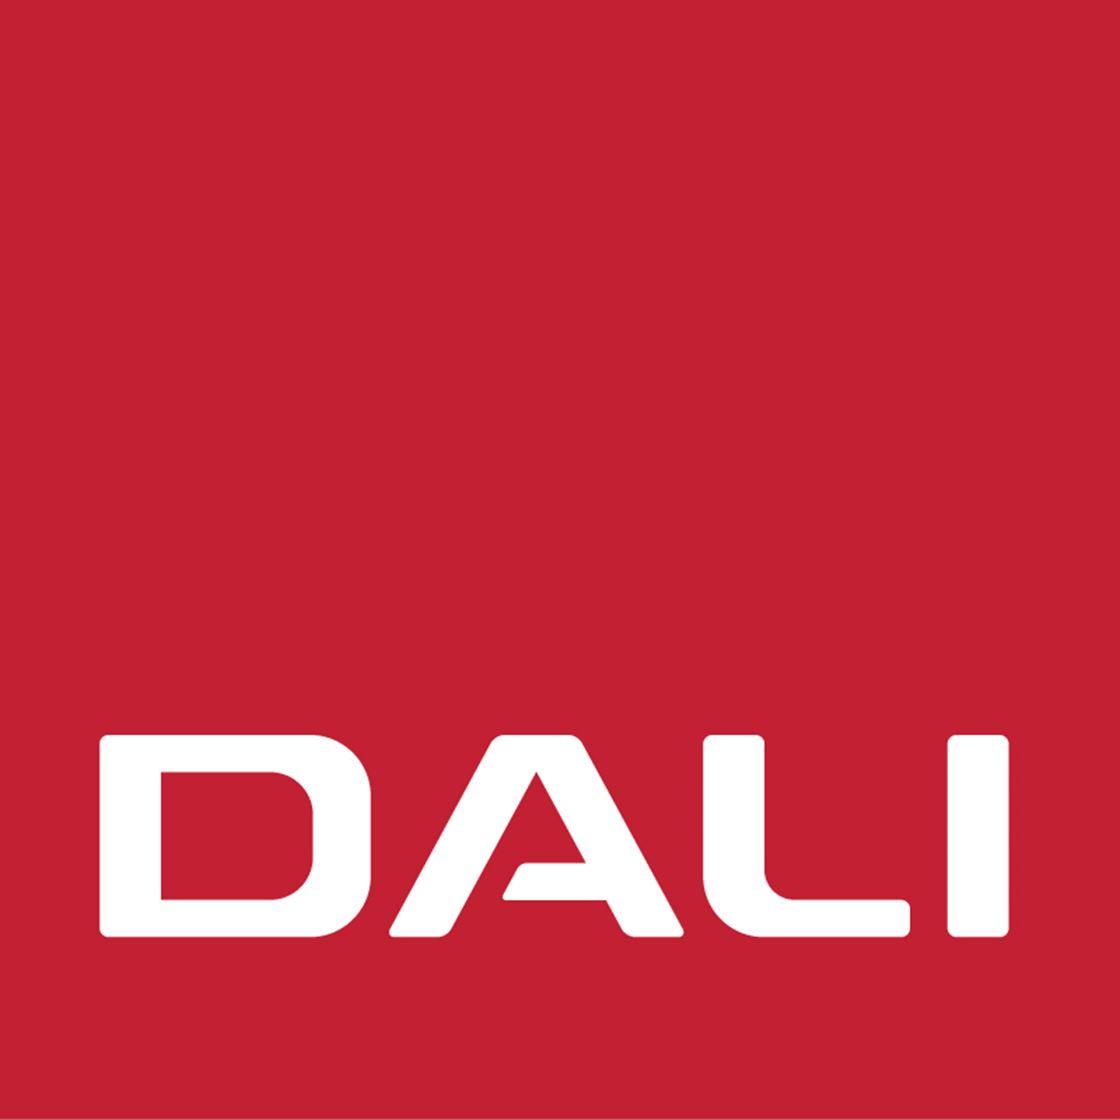 DALI Speakers | Danish made, award-winning Hi-Fi Speakers